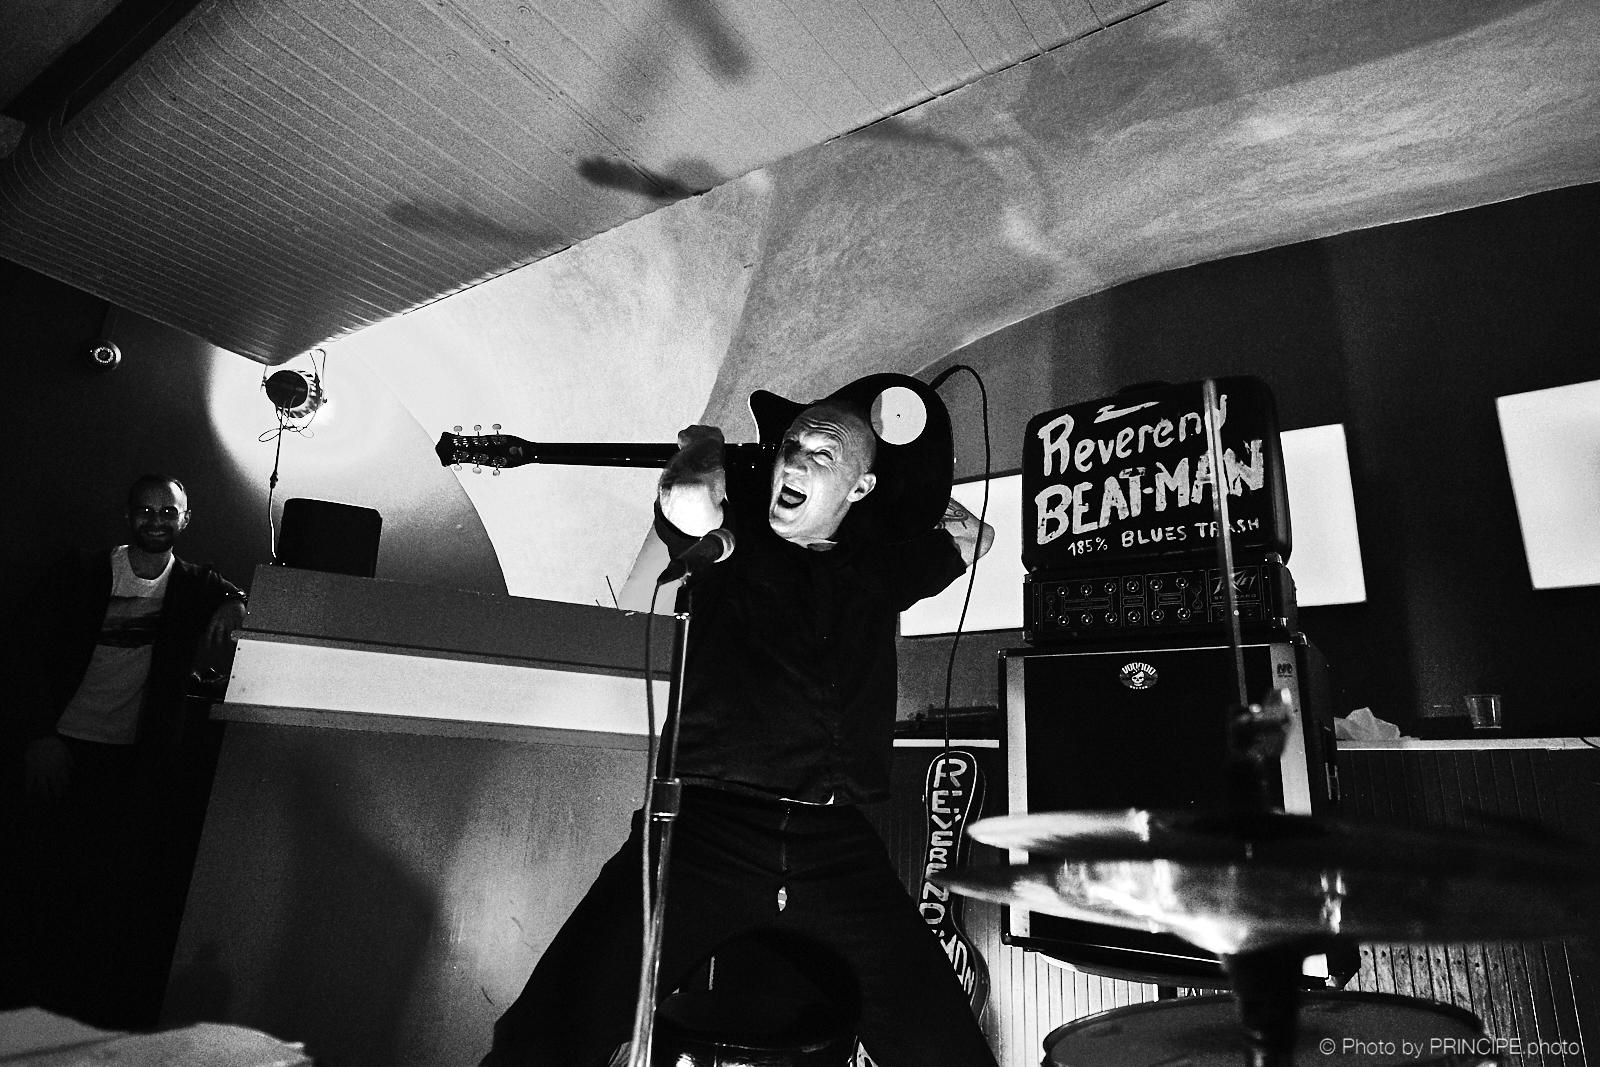 Reverend Beat-Man @ Melocoton Club